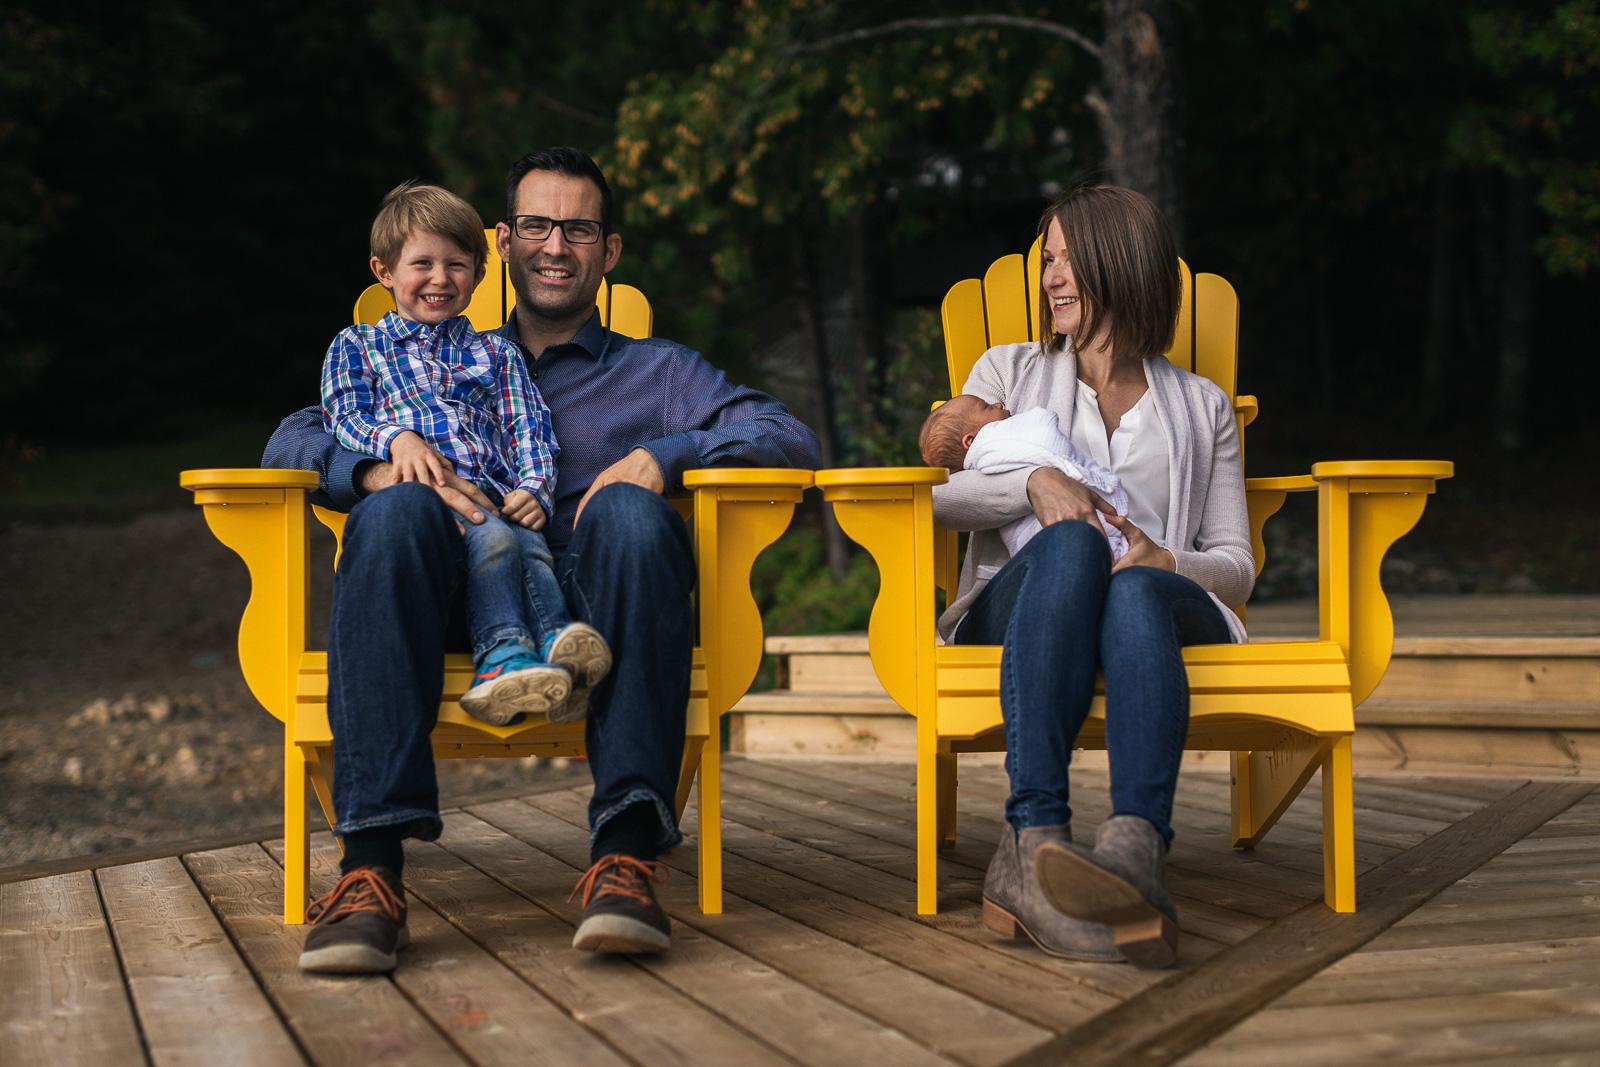 shauna-patrick-family-portraits-blog-24.jpg